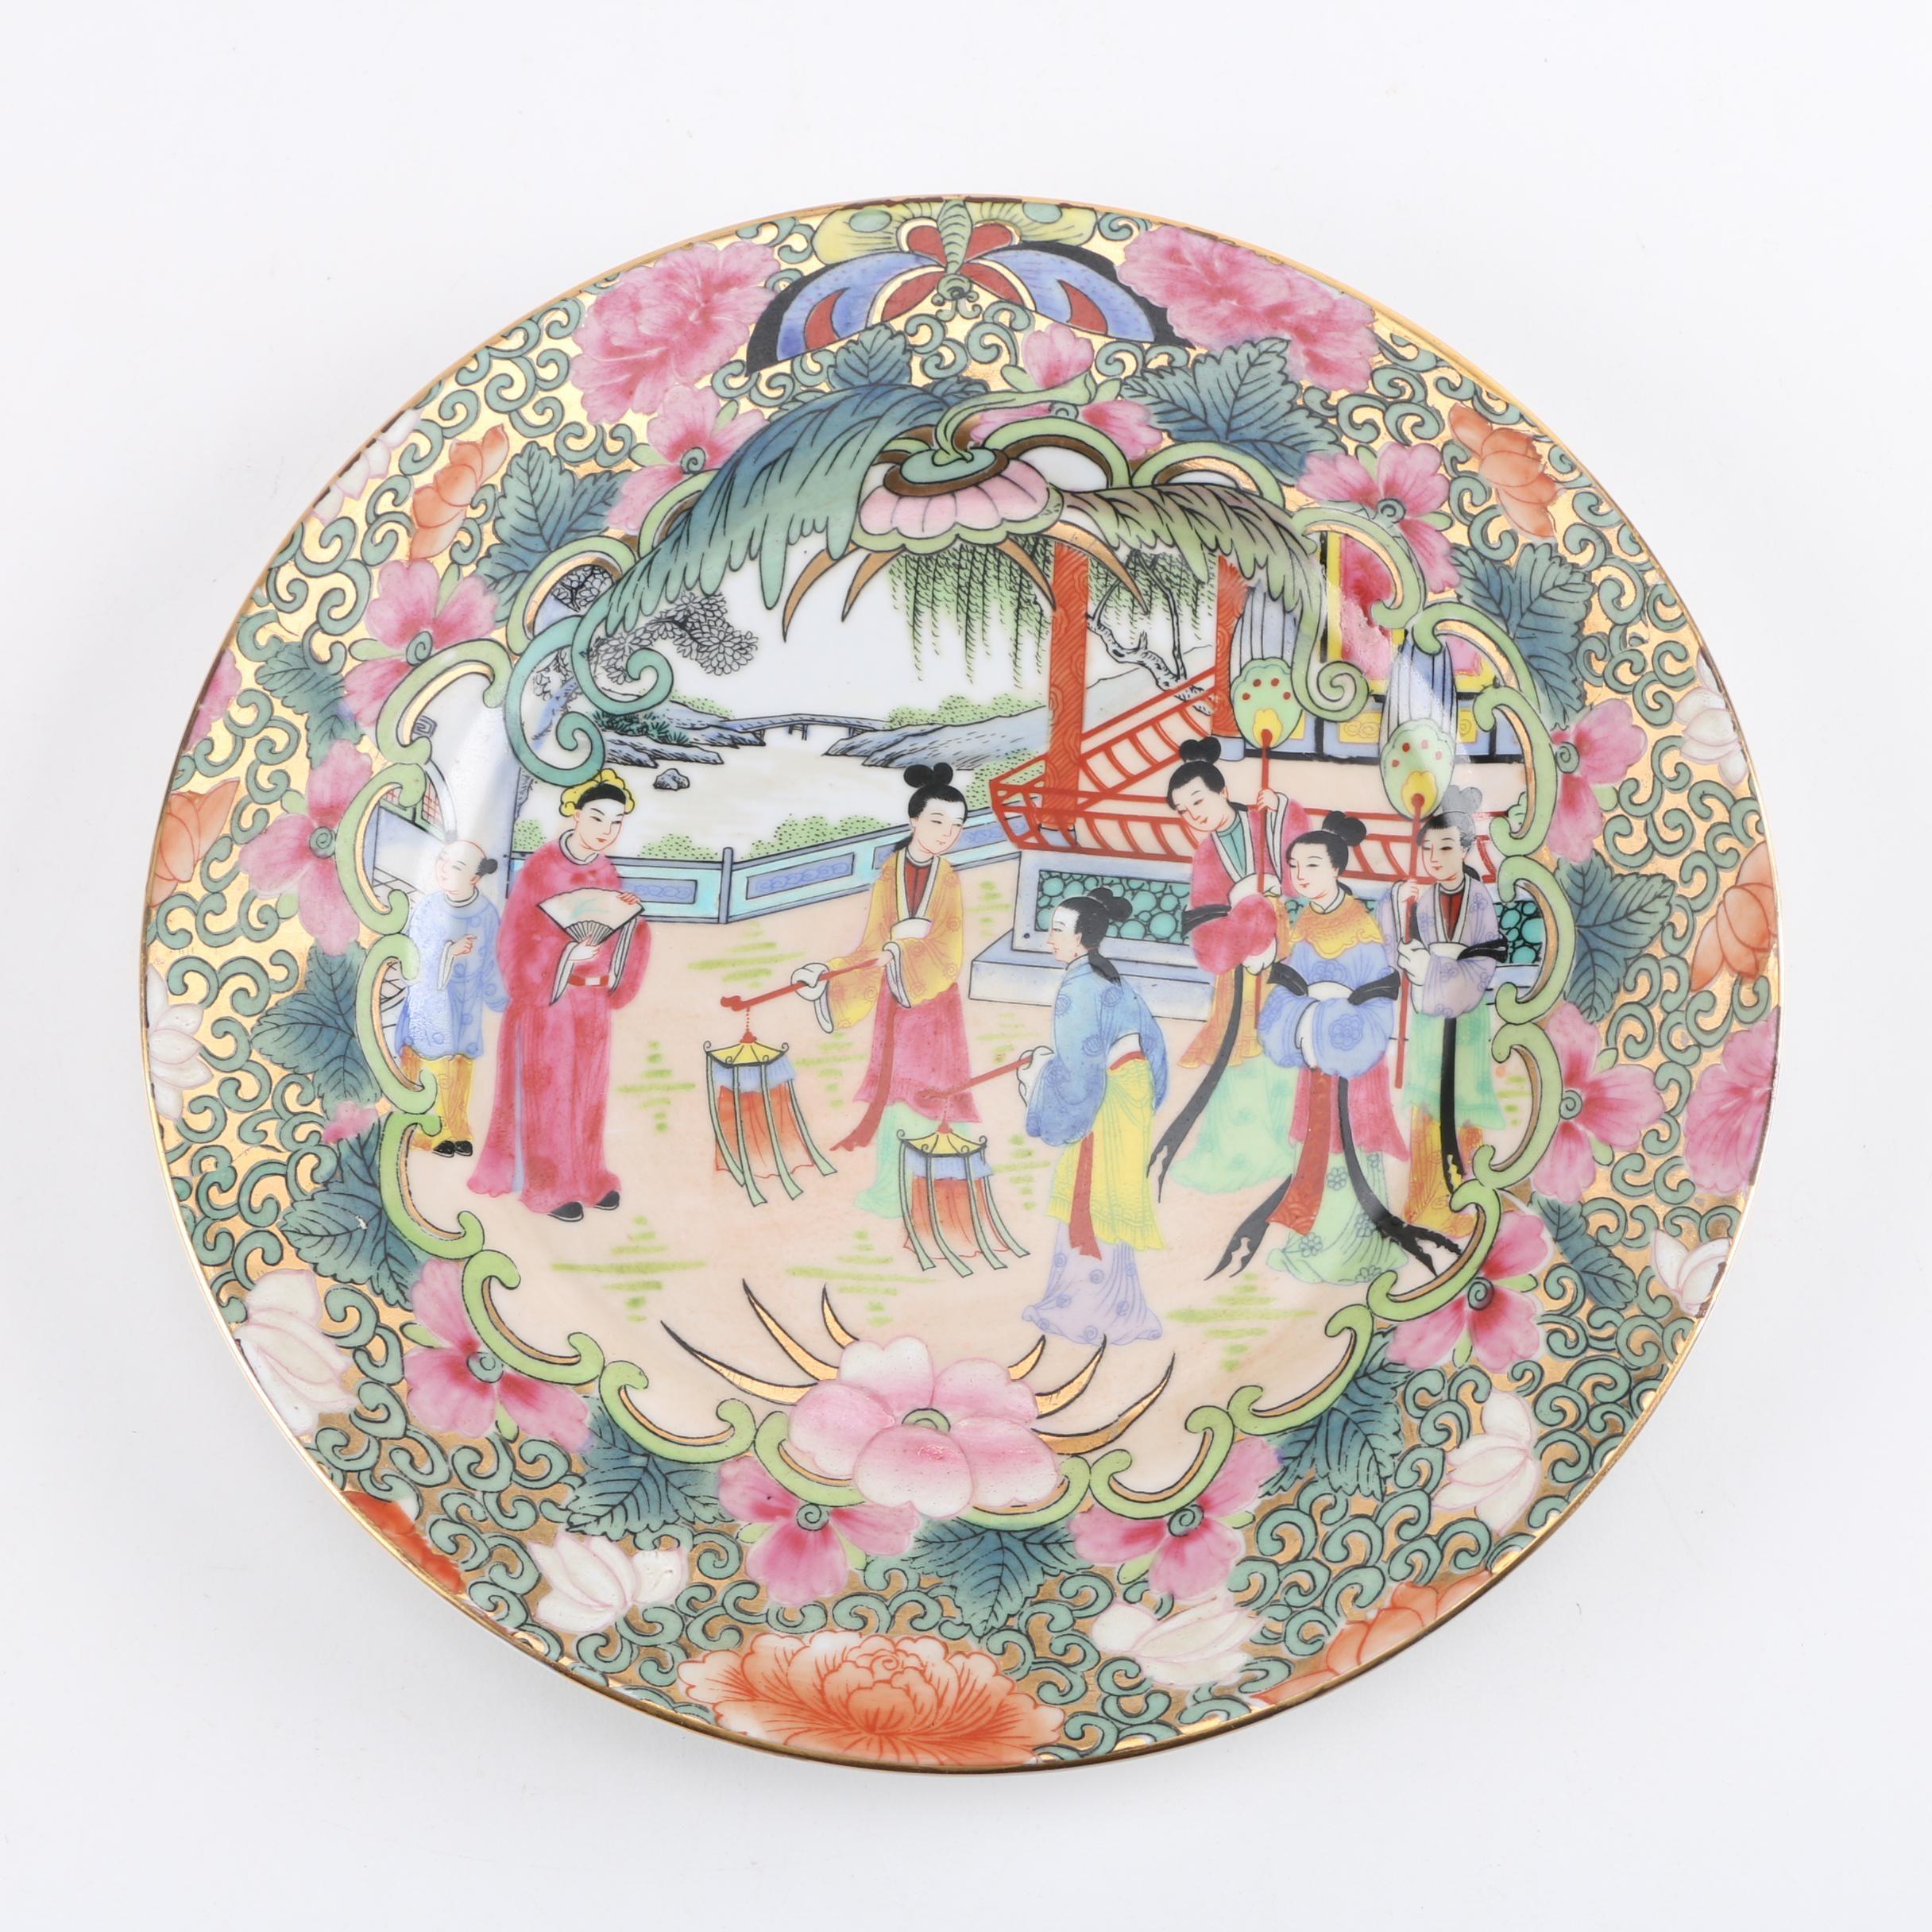 Chinese Decorative Ceramic Plate